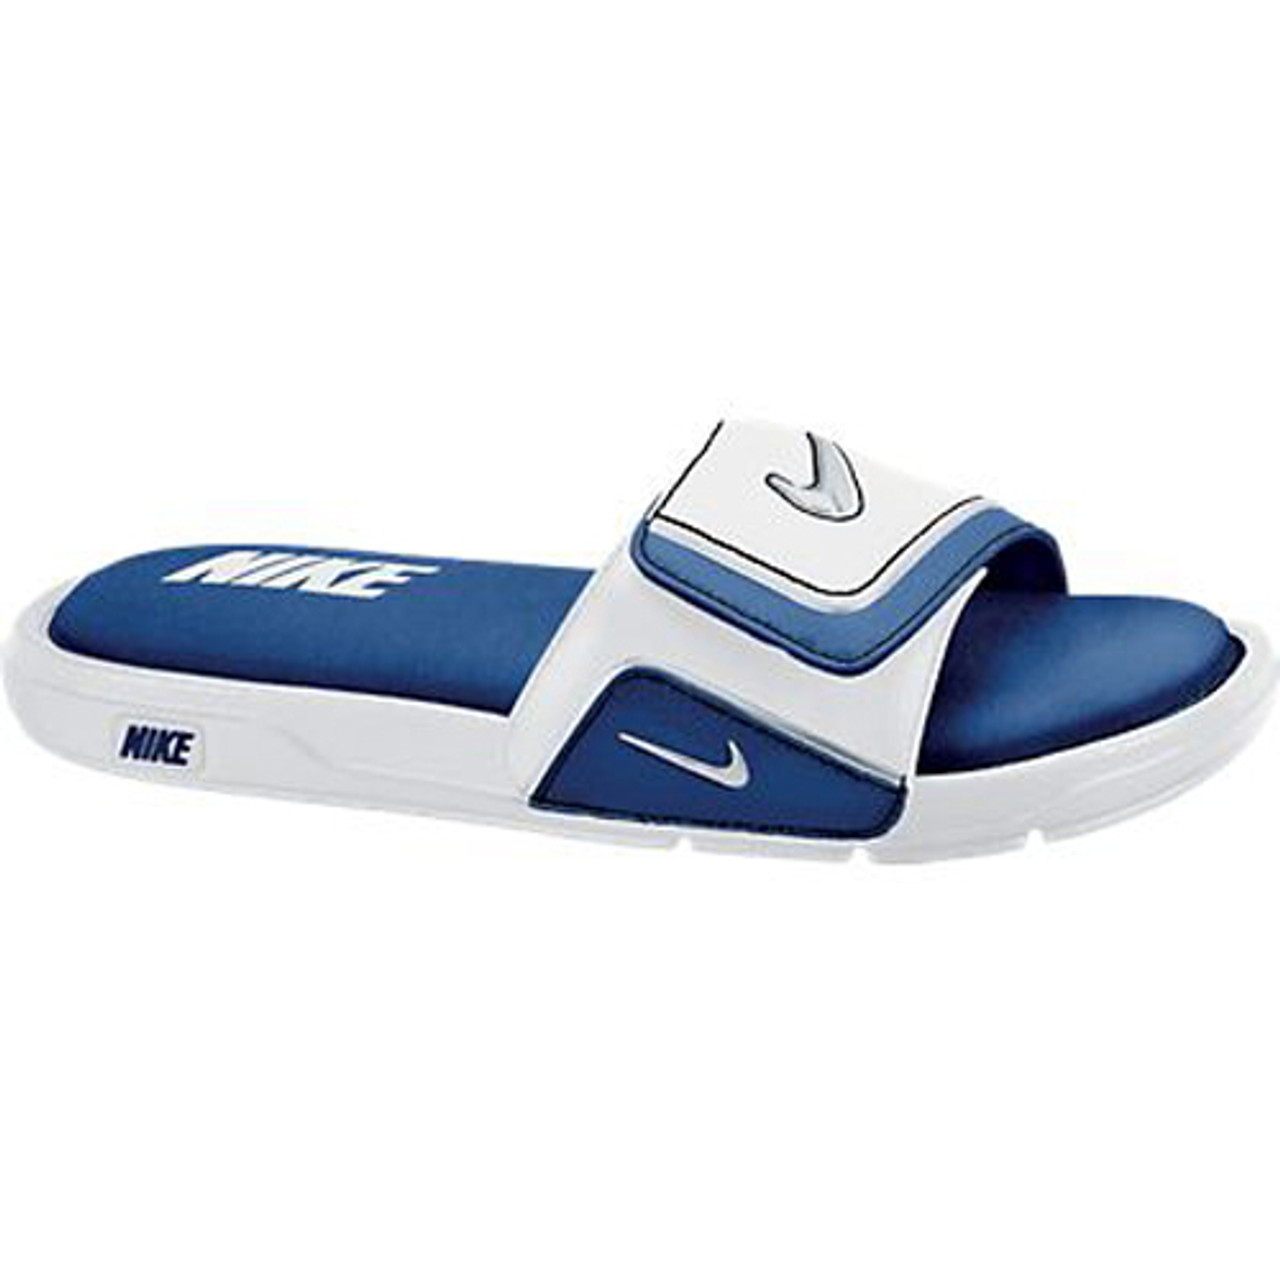 3bf844752 Nike Comfort Slide 2 White/Royal Mens Sandals - Shop now @ Shoolu.com